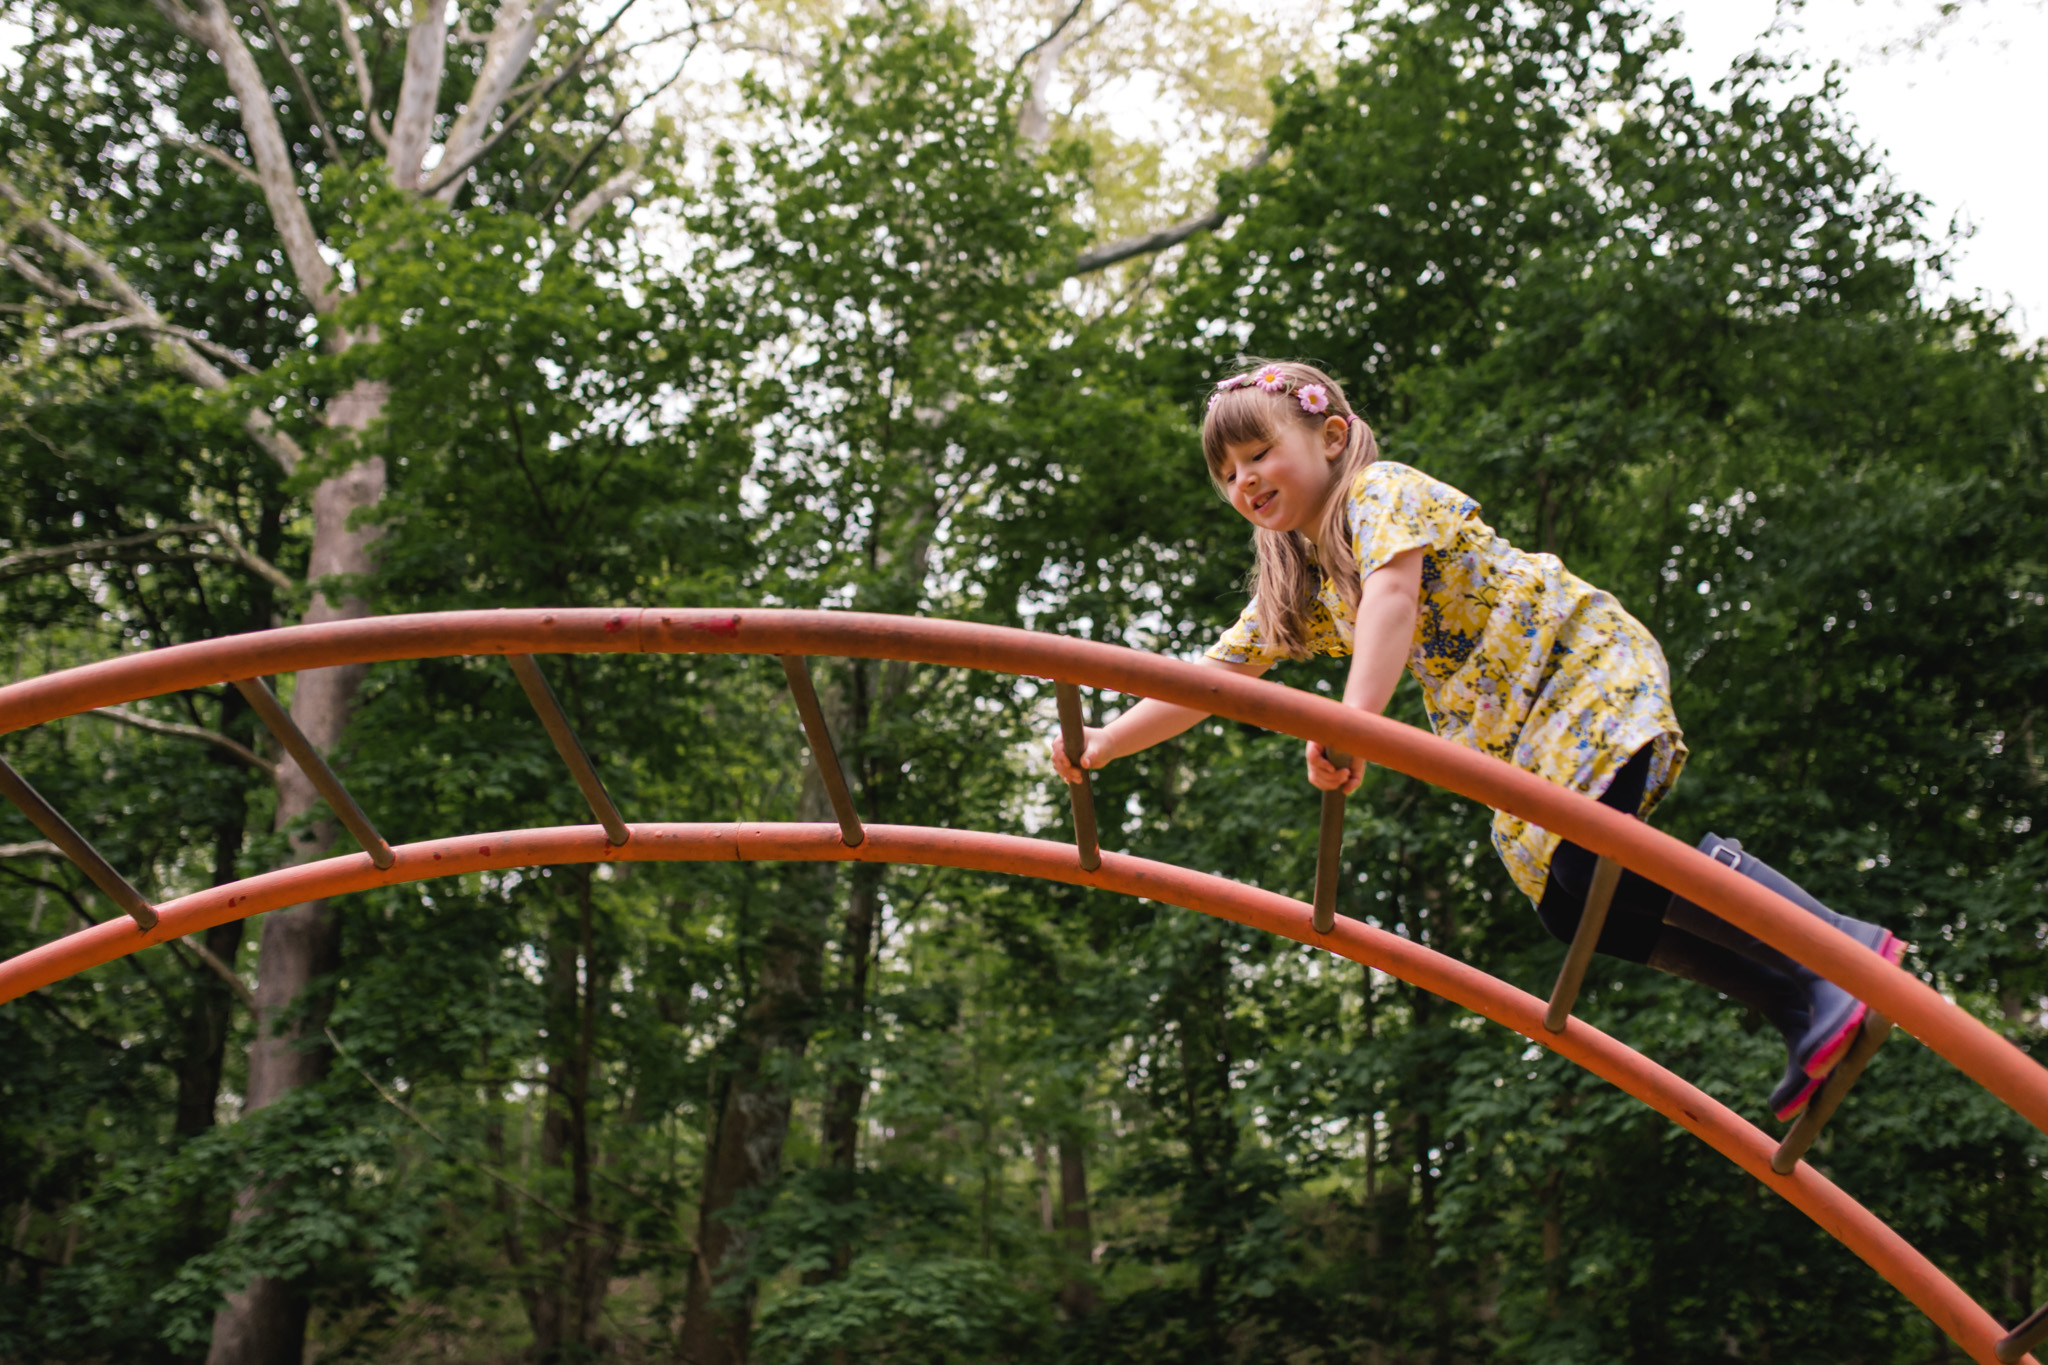 AnneMarie-Hamant-Lehigh Valley PA photographer-www.annemariehamant.com-18.jpg